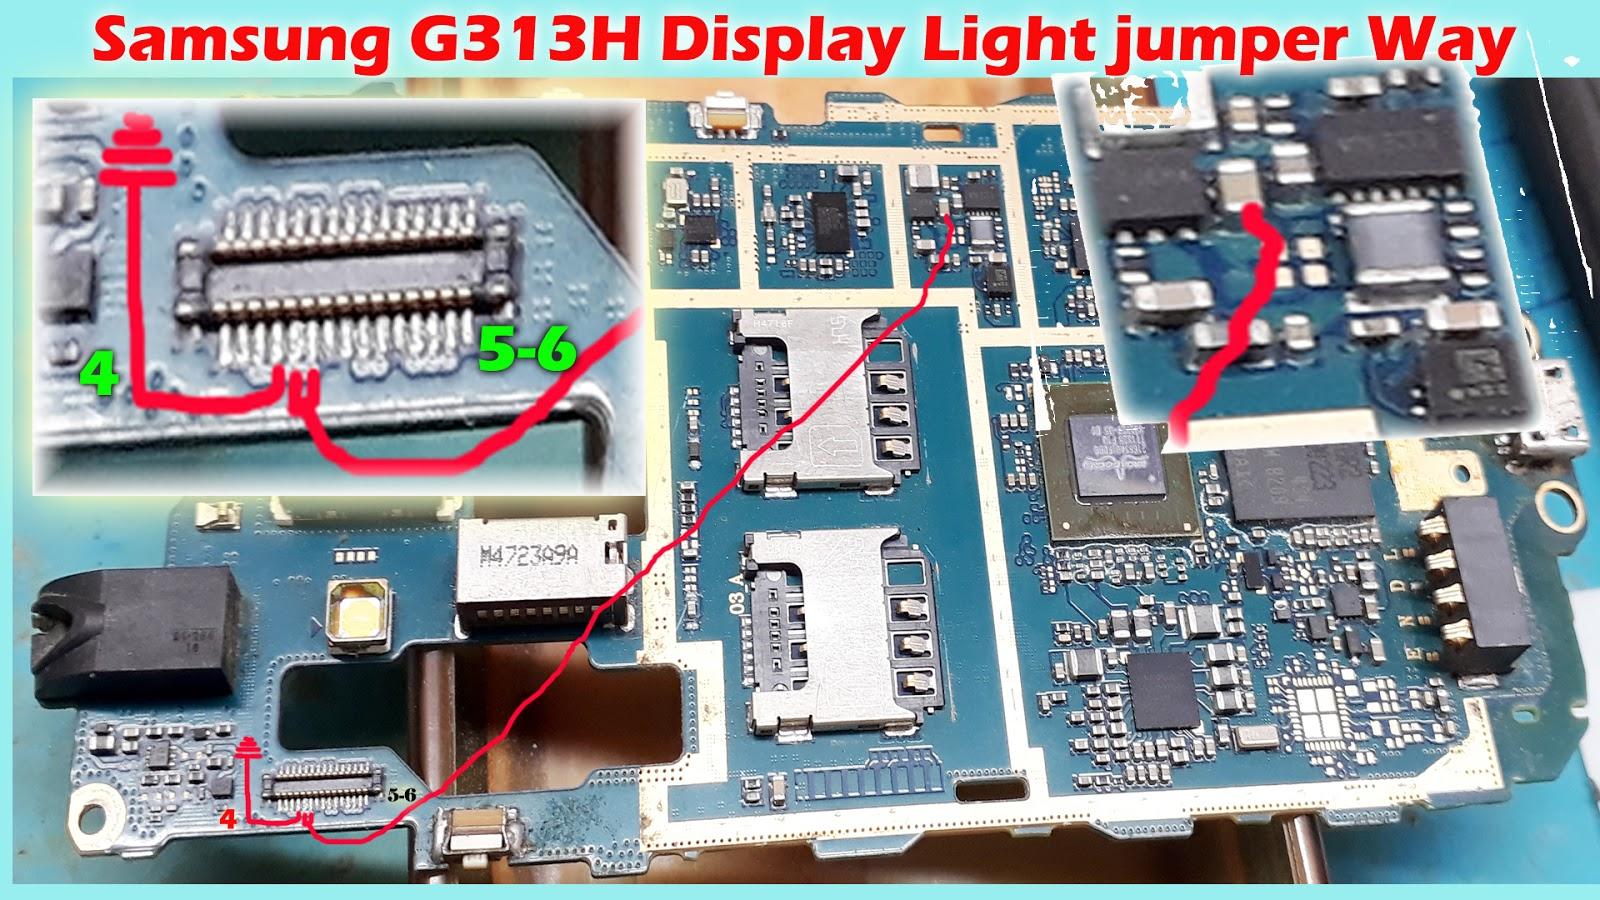 Only aasaan: Samsung G313HU/DD Display Light Jumper Way Solution